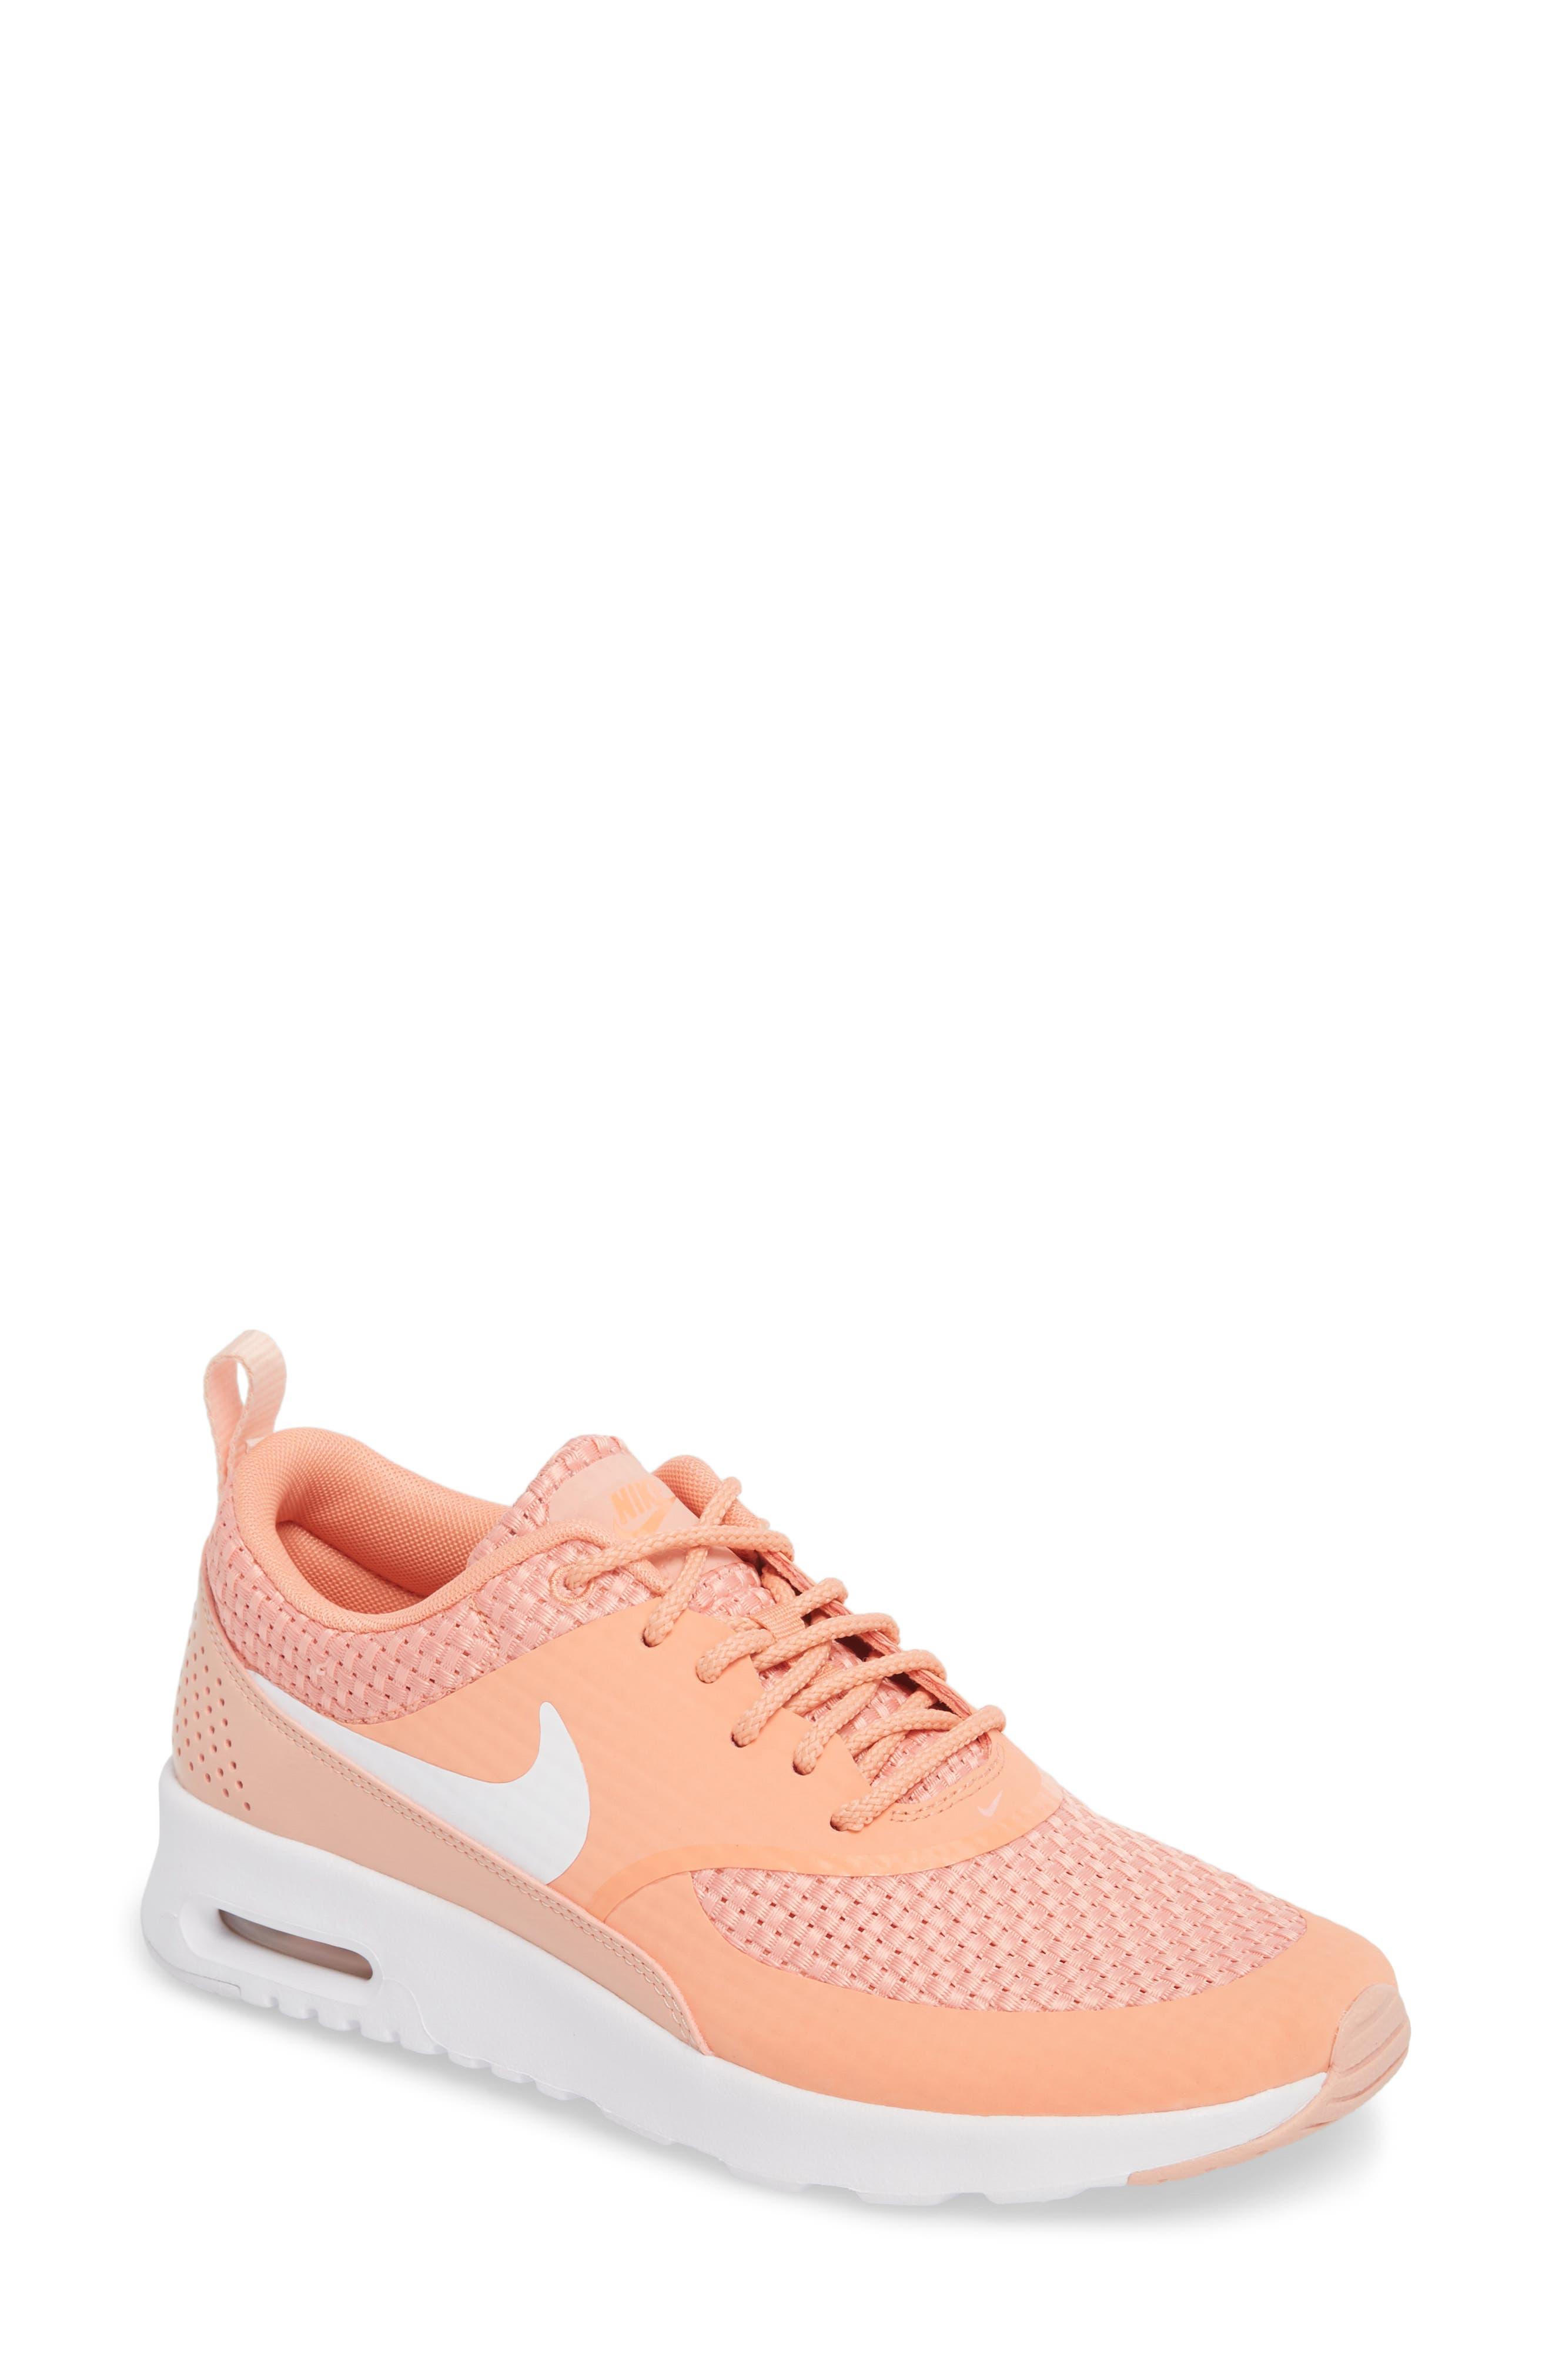 Air Max Thea Sneaker,                         Main,                         color, Crimson Bliss/ White